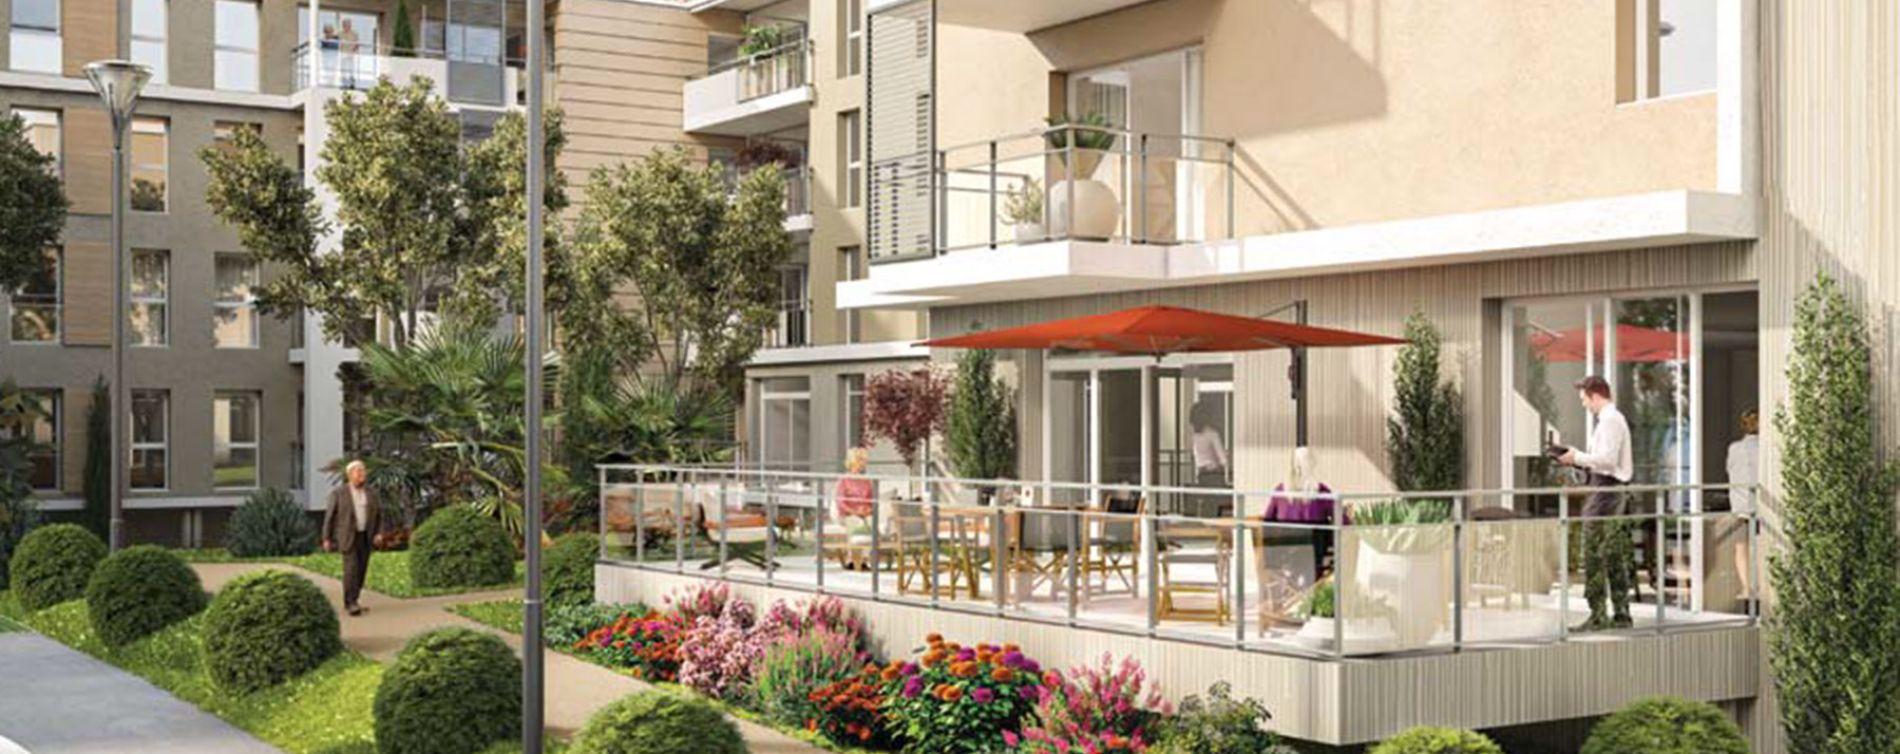 Fréjus : programme immobilier neuve « Les Balcons de la Villa Marina » (2)